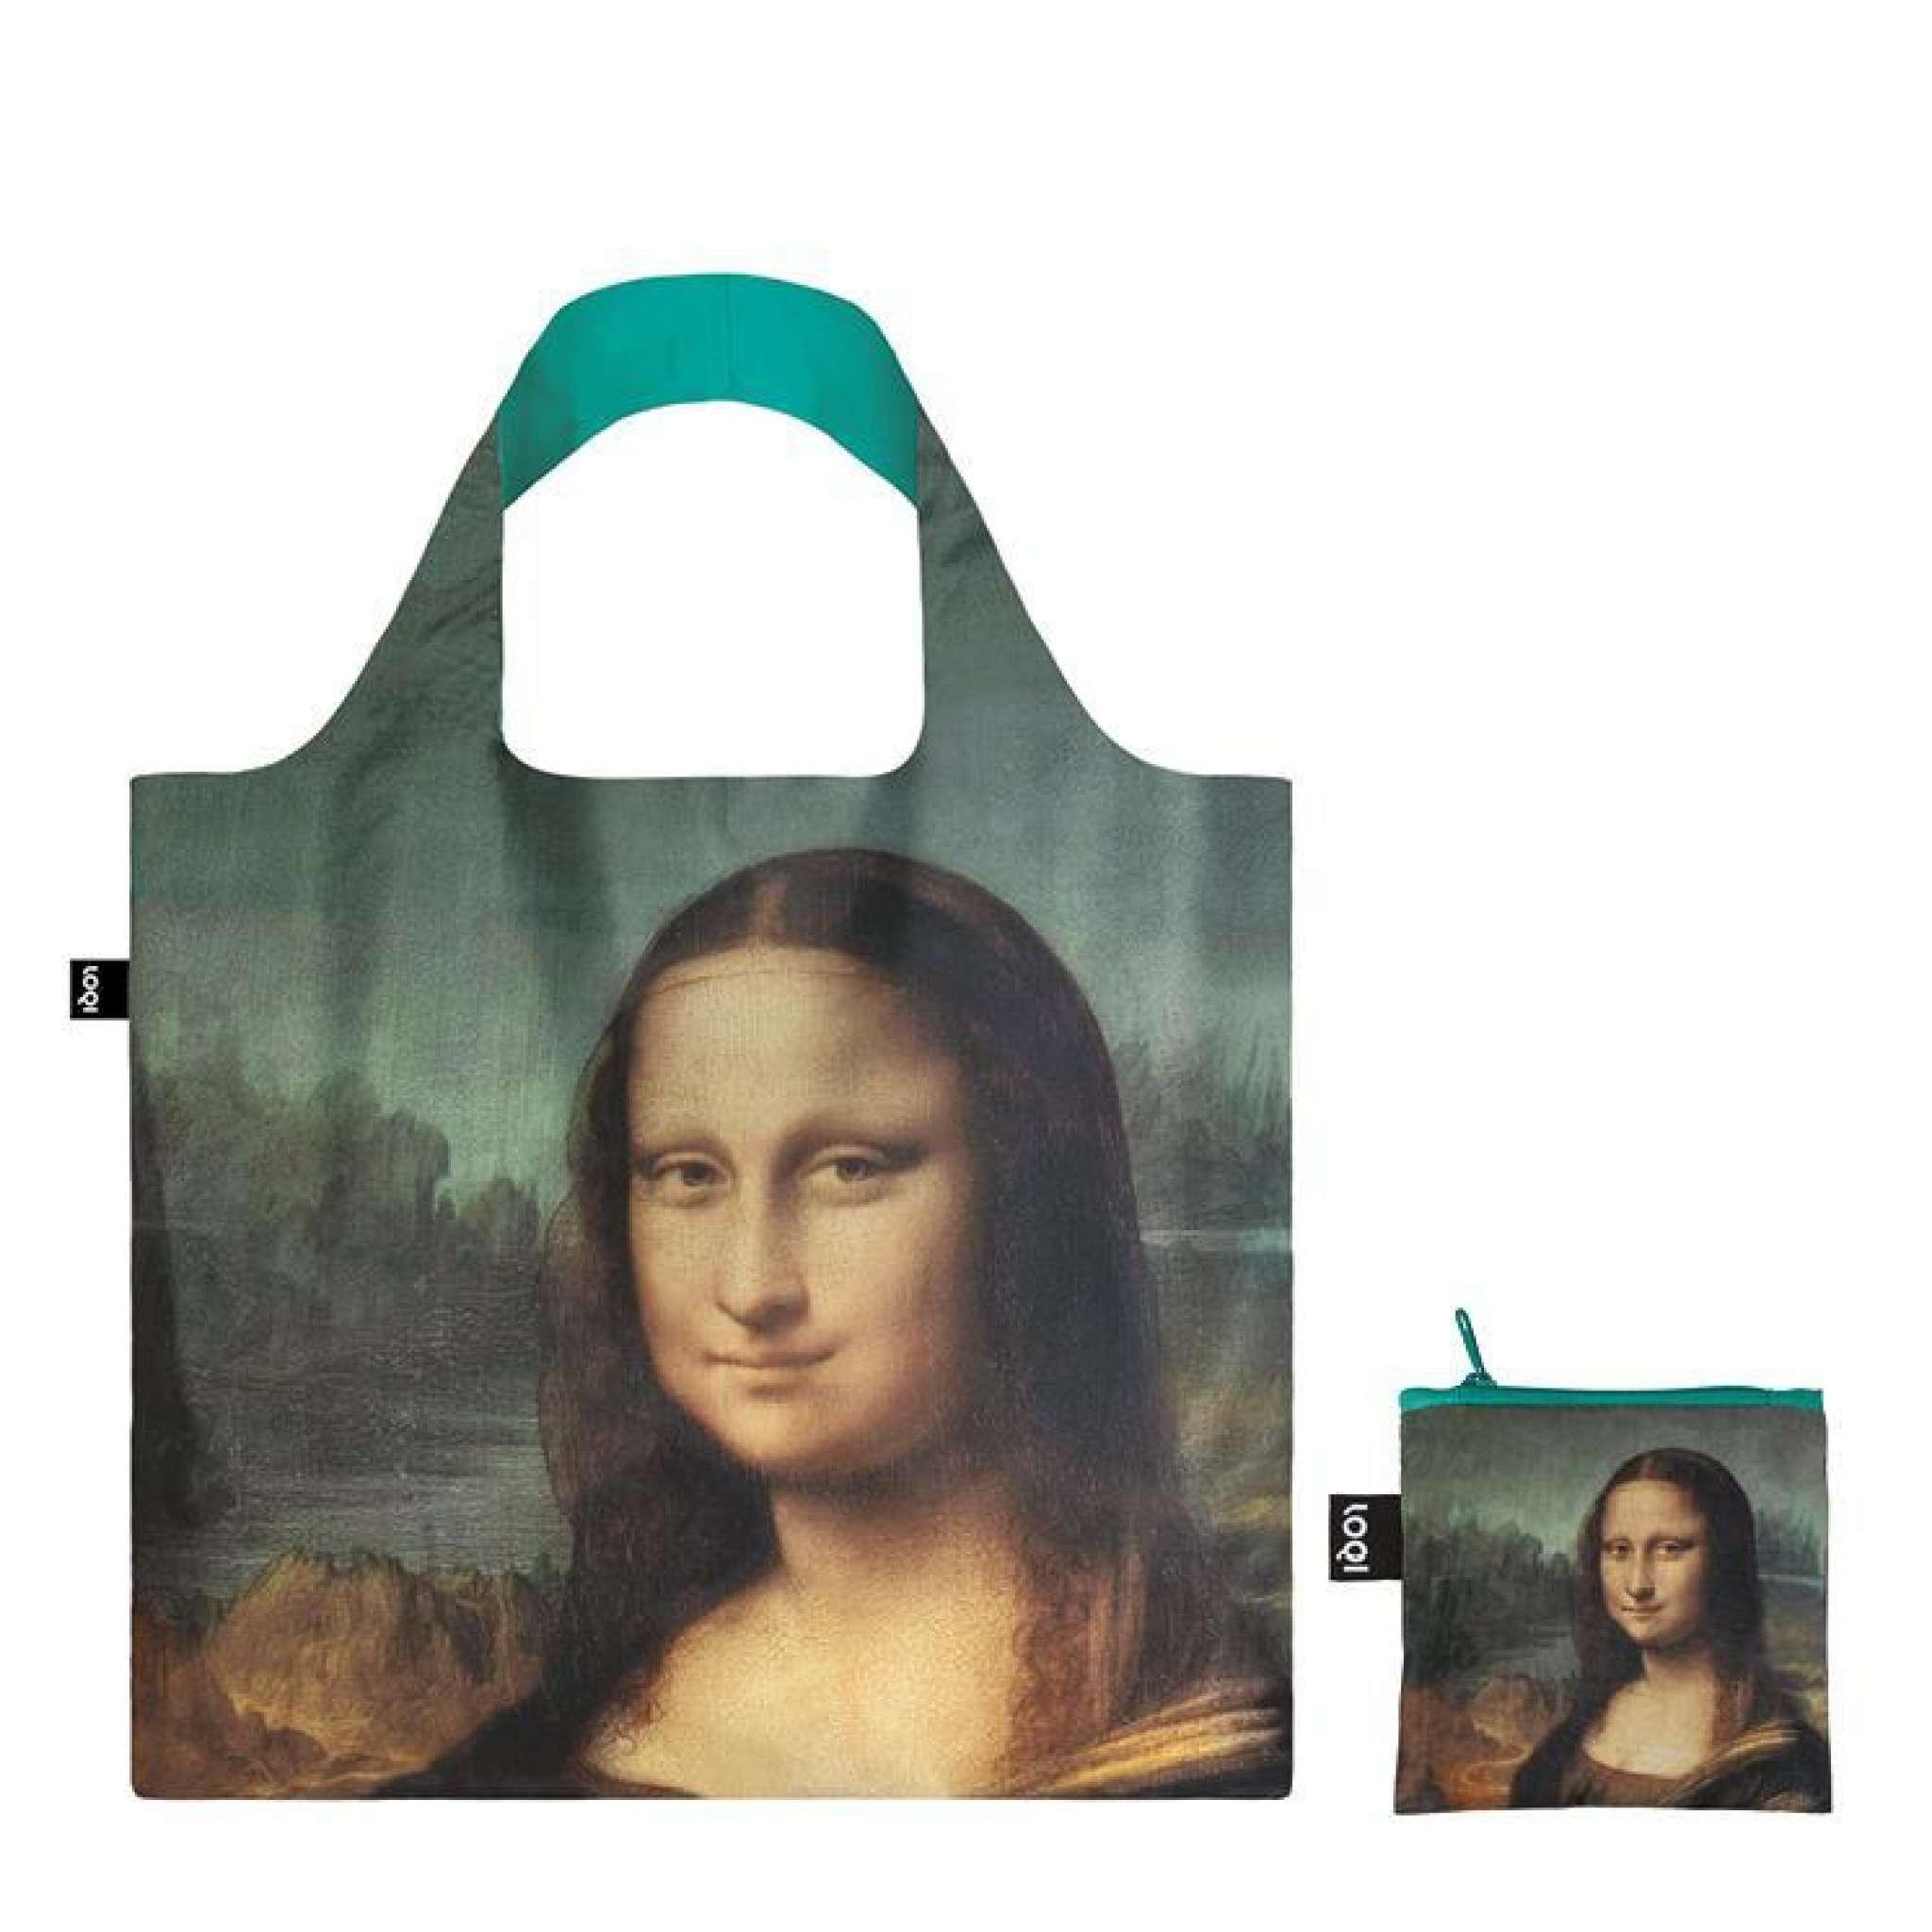 Shoppingbag, Leonardi Da Vinci's Mona Lisa